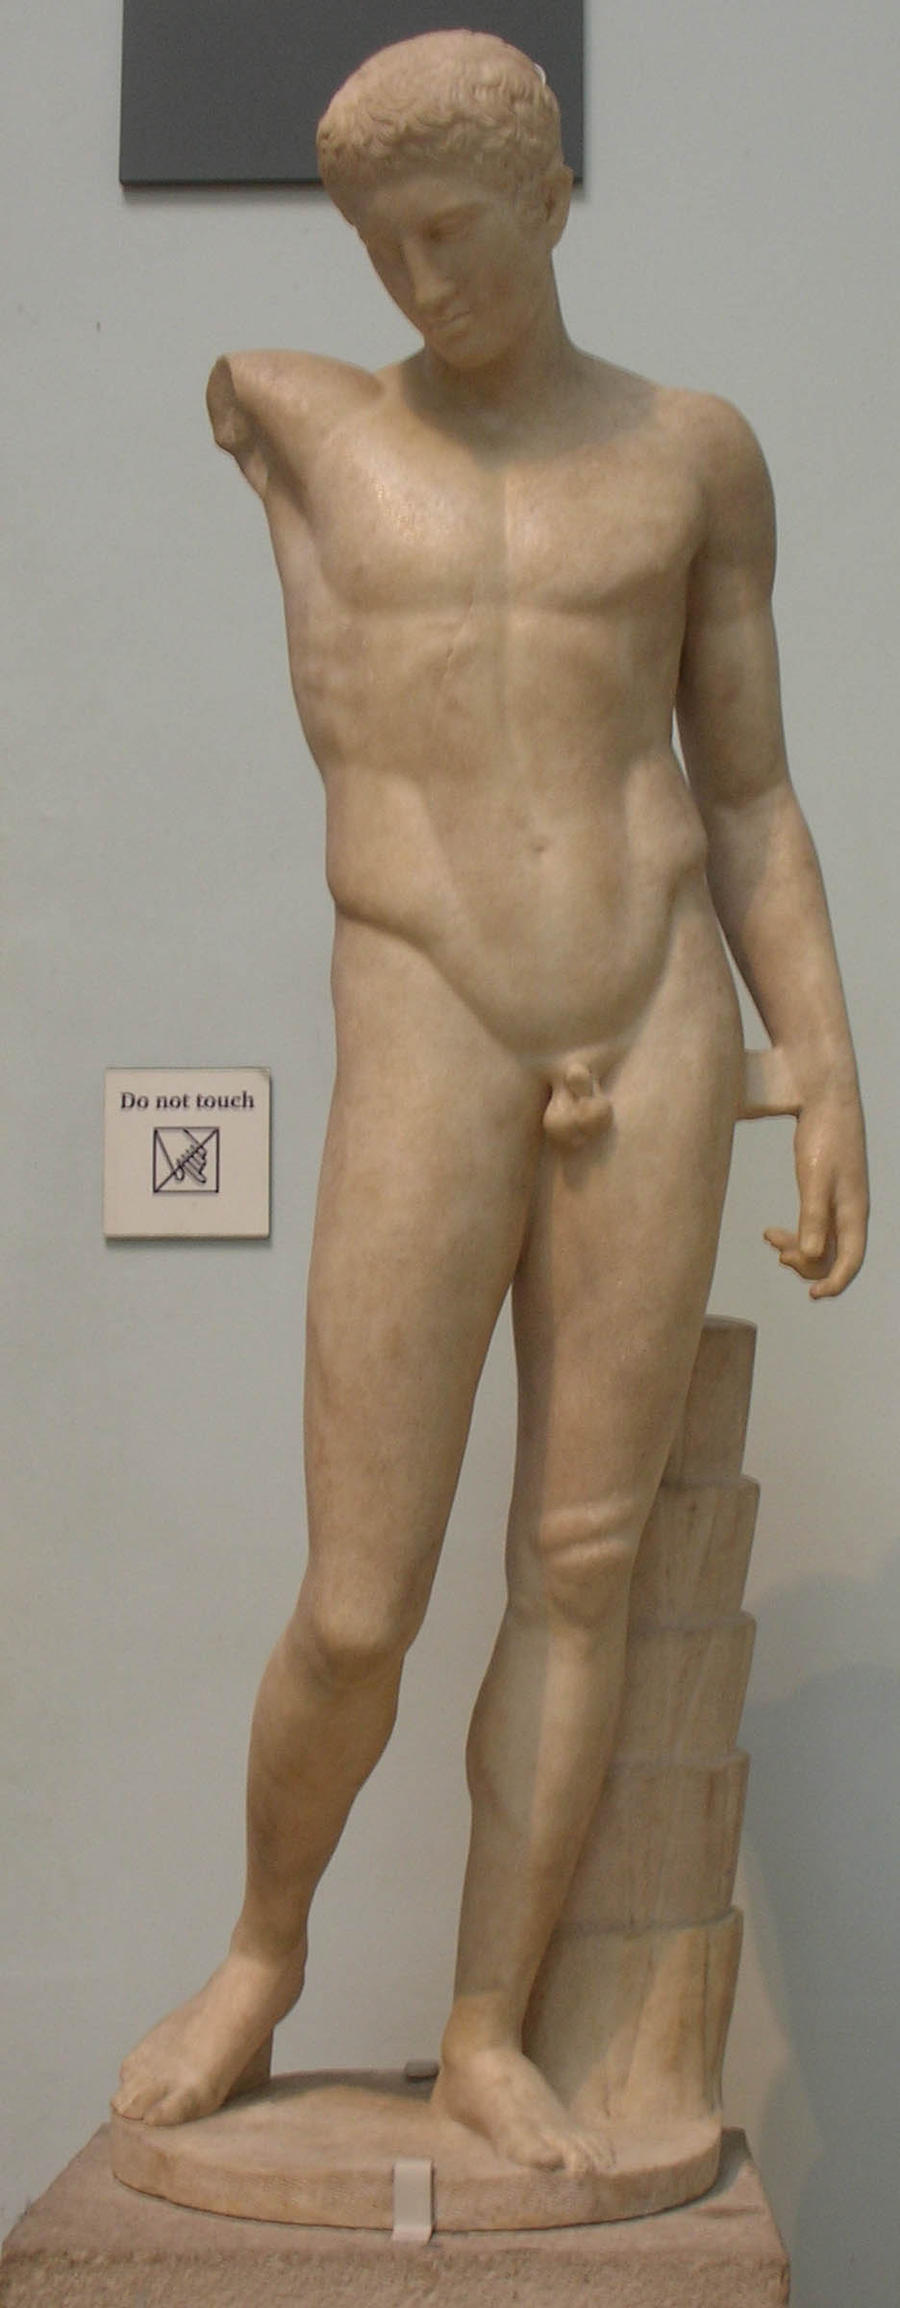 Male Nude Statue 101